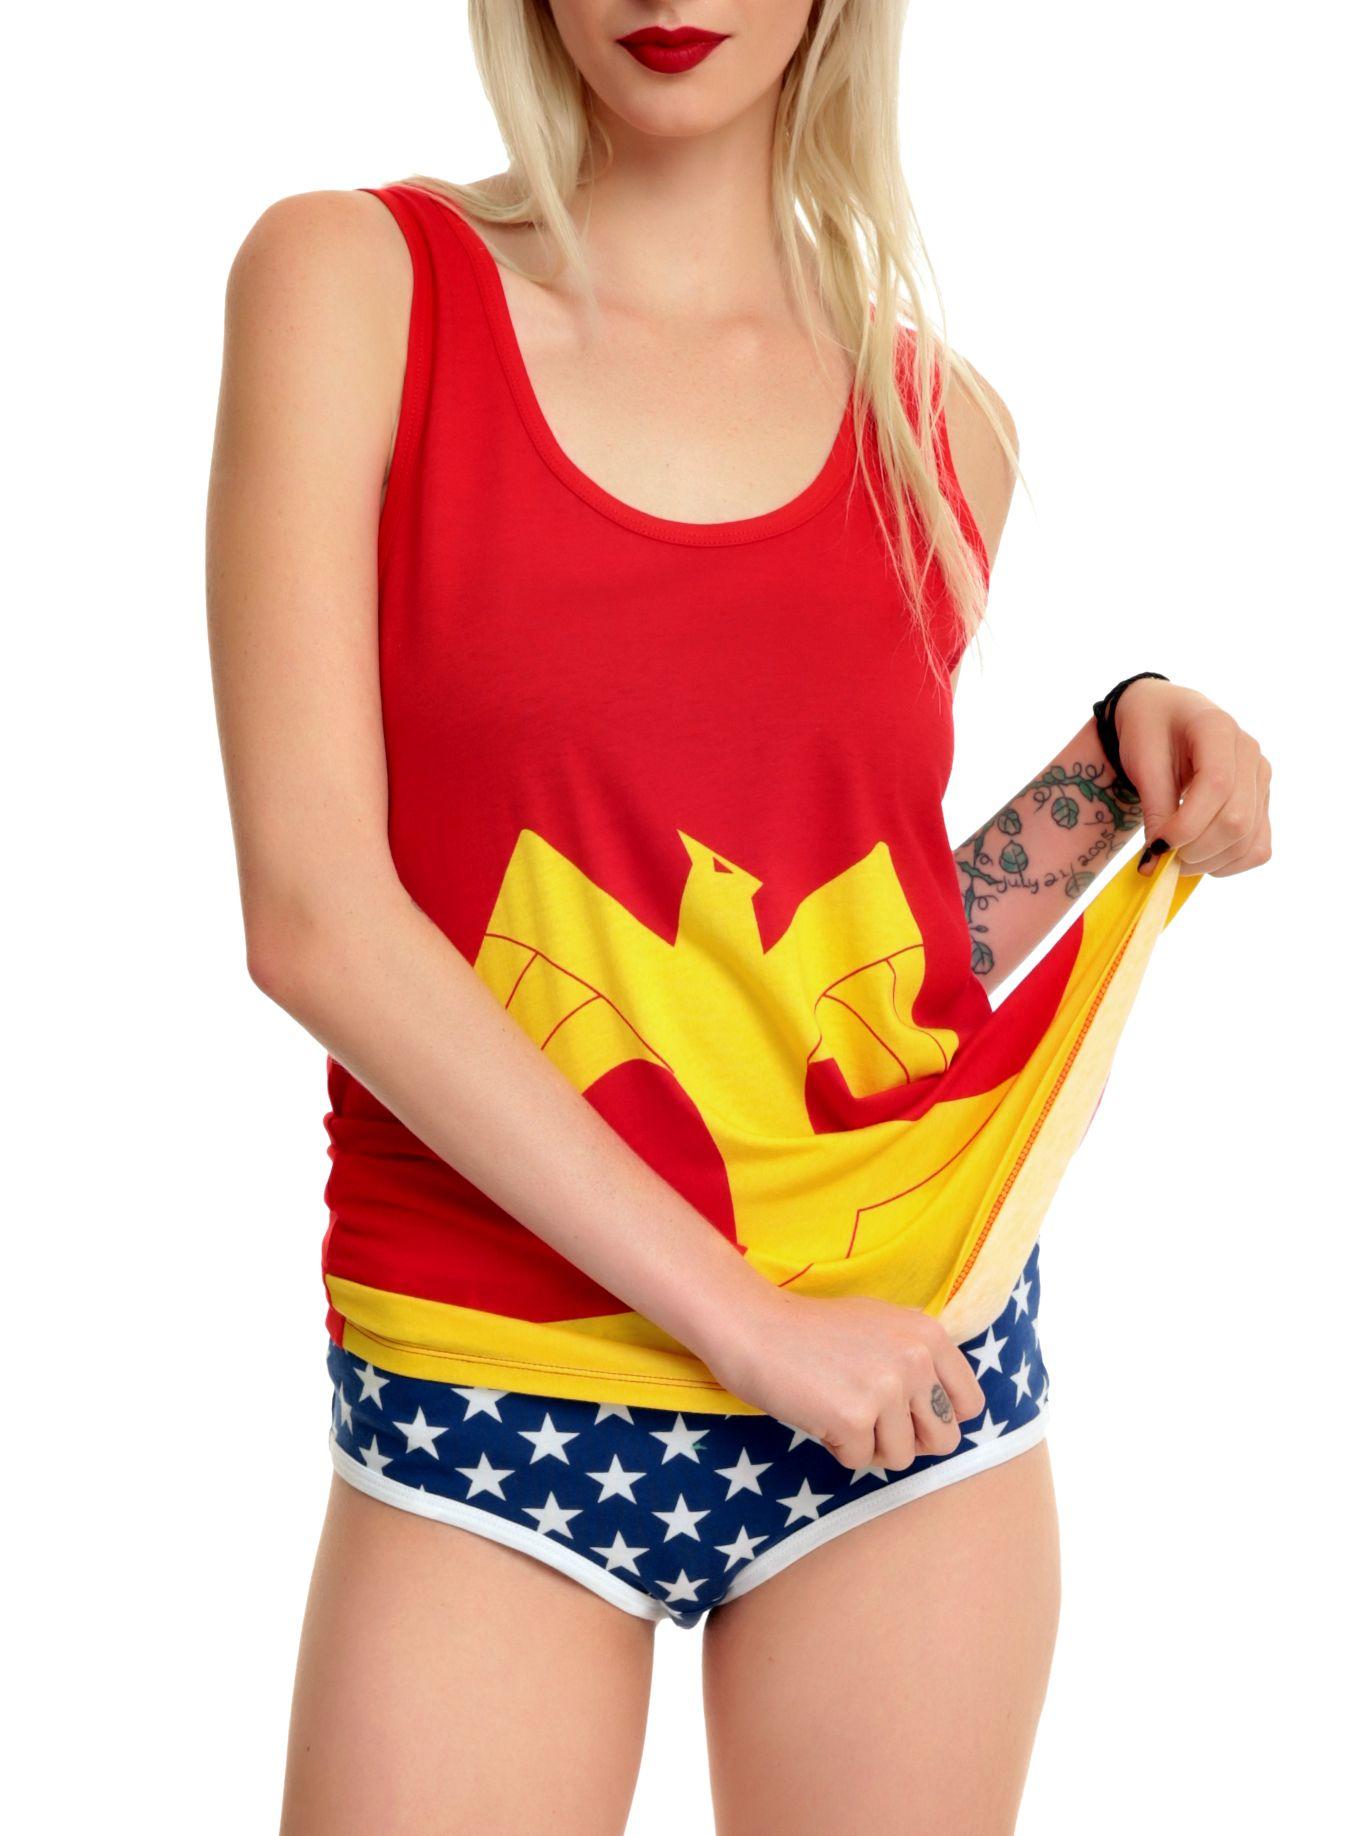 da01c83f1f I always wanted some when I was a kid and never got them. Underoos DC  Comics Wonder Woman Girls Underwear Set